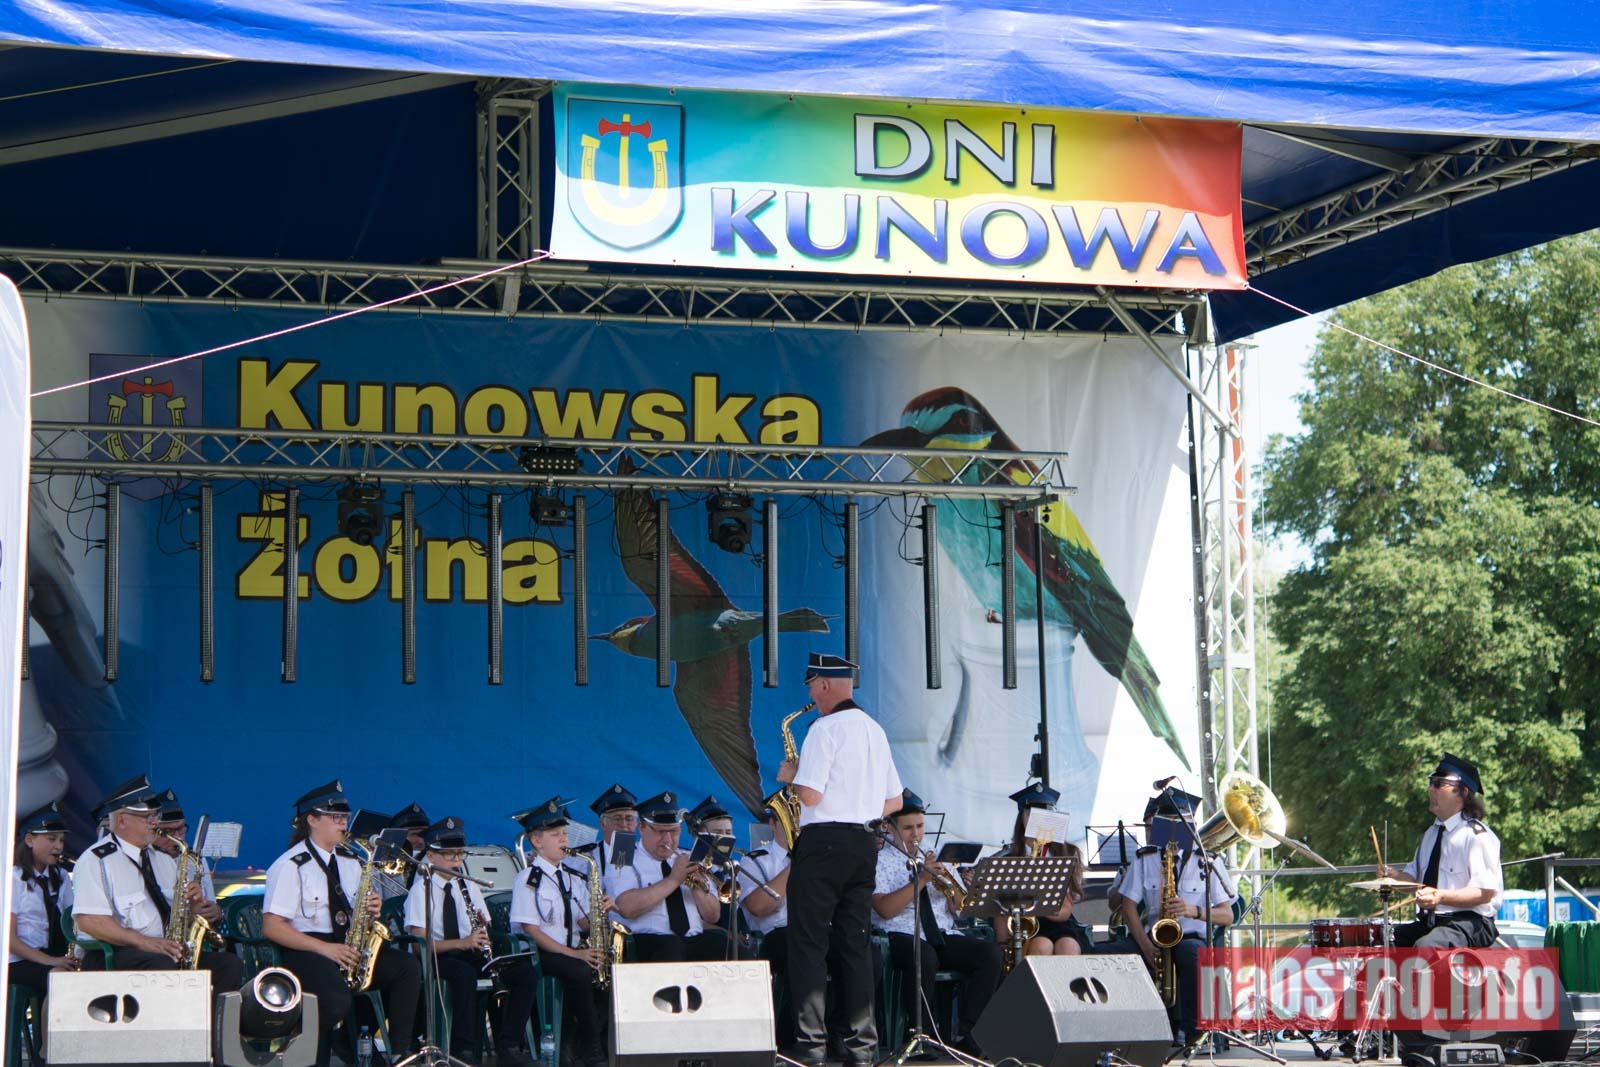 NaOSTRO Dni Kunowa-2